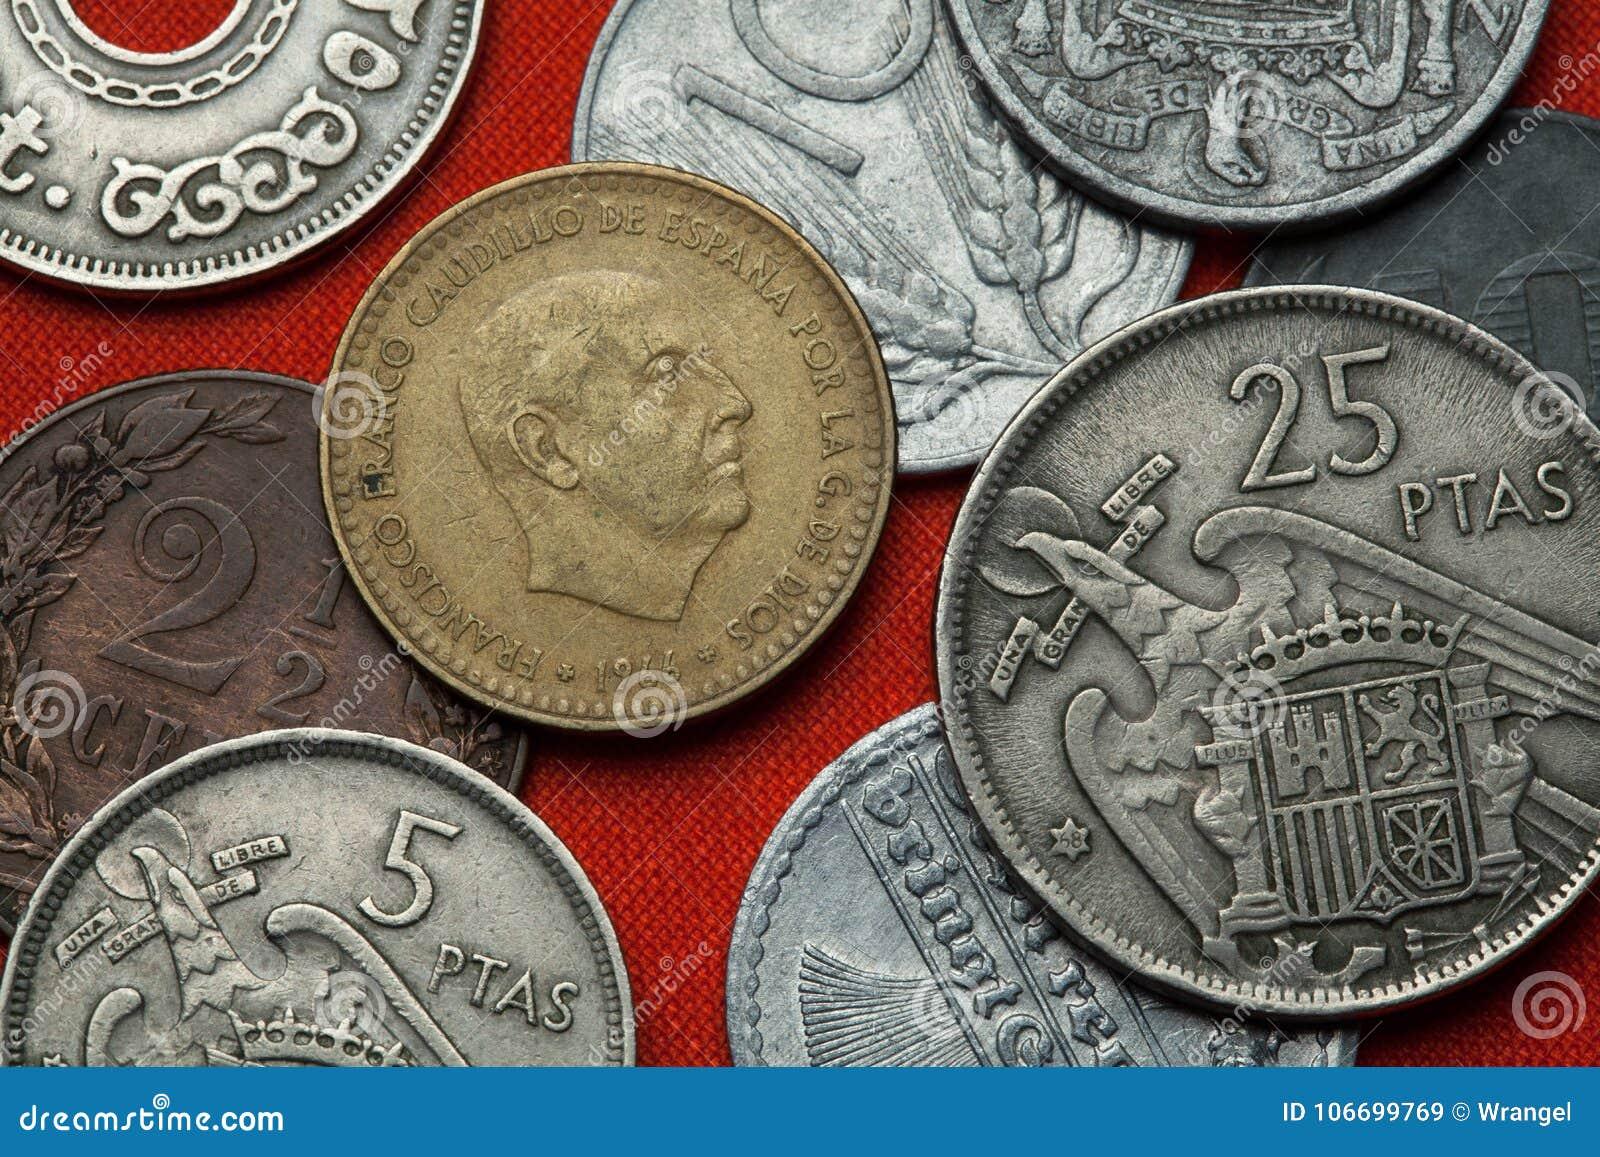 Monety Hiszpania Hiszpański dyktator Francisco Franco